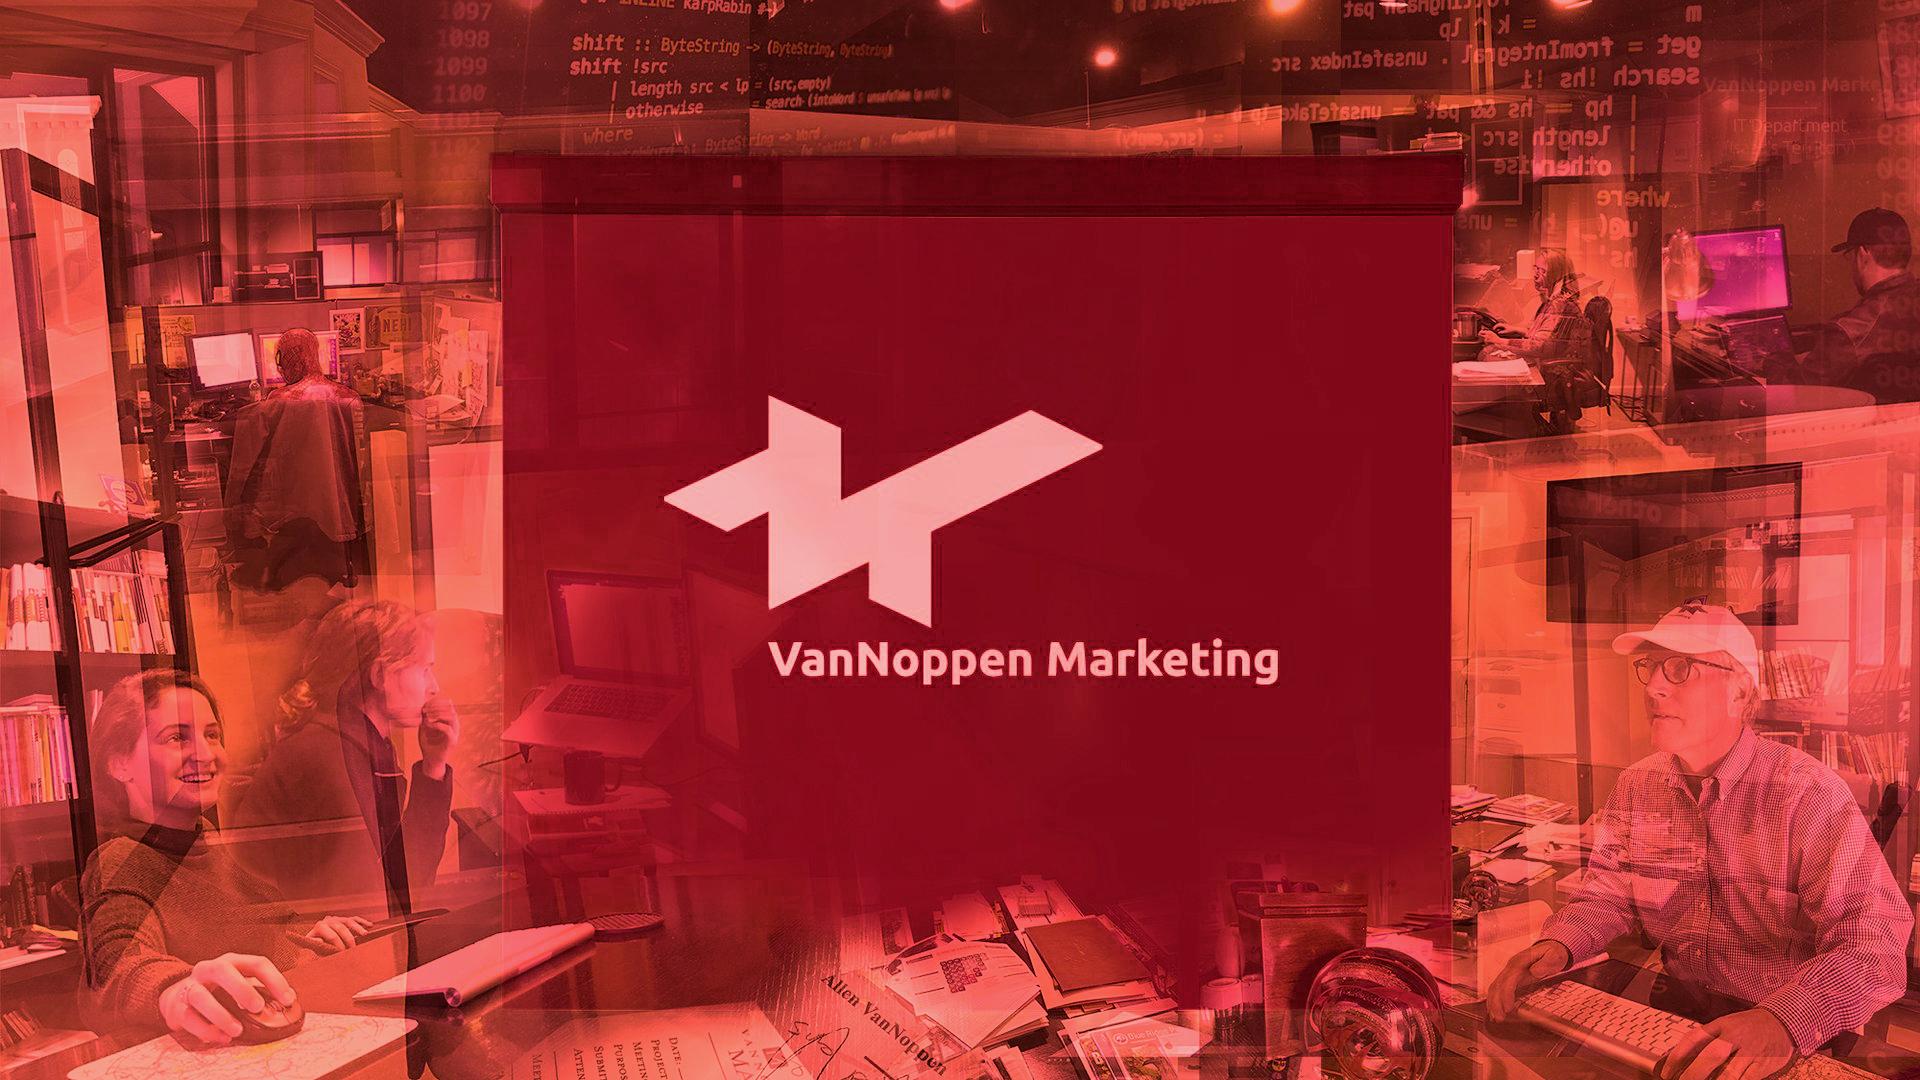 VanNoppen Marketing NVN Memoryscape